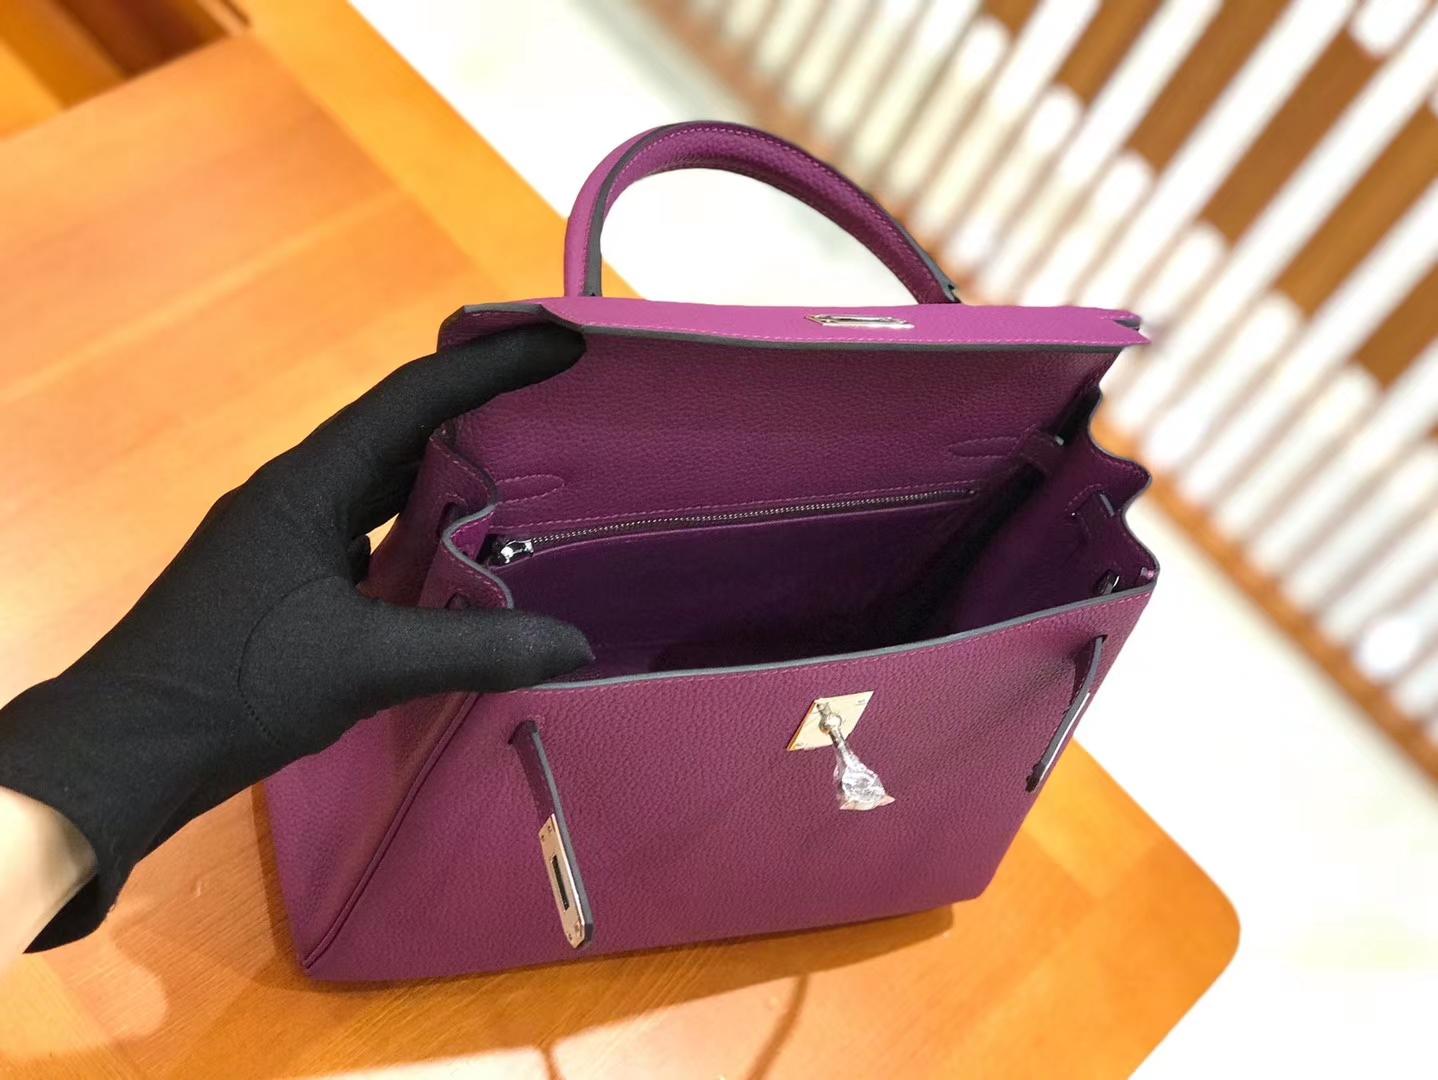 Hermès(爱马仕)Kelly 25cm togo小牛皮 海葵紫 银扣 全手工缝制